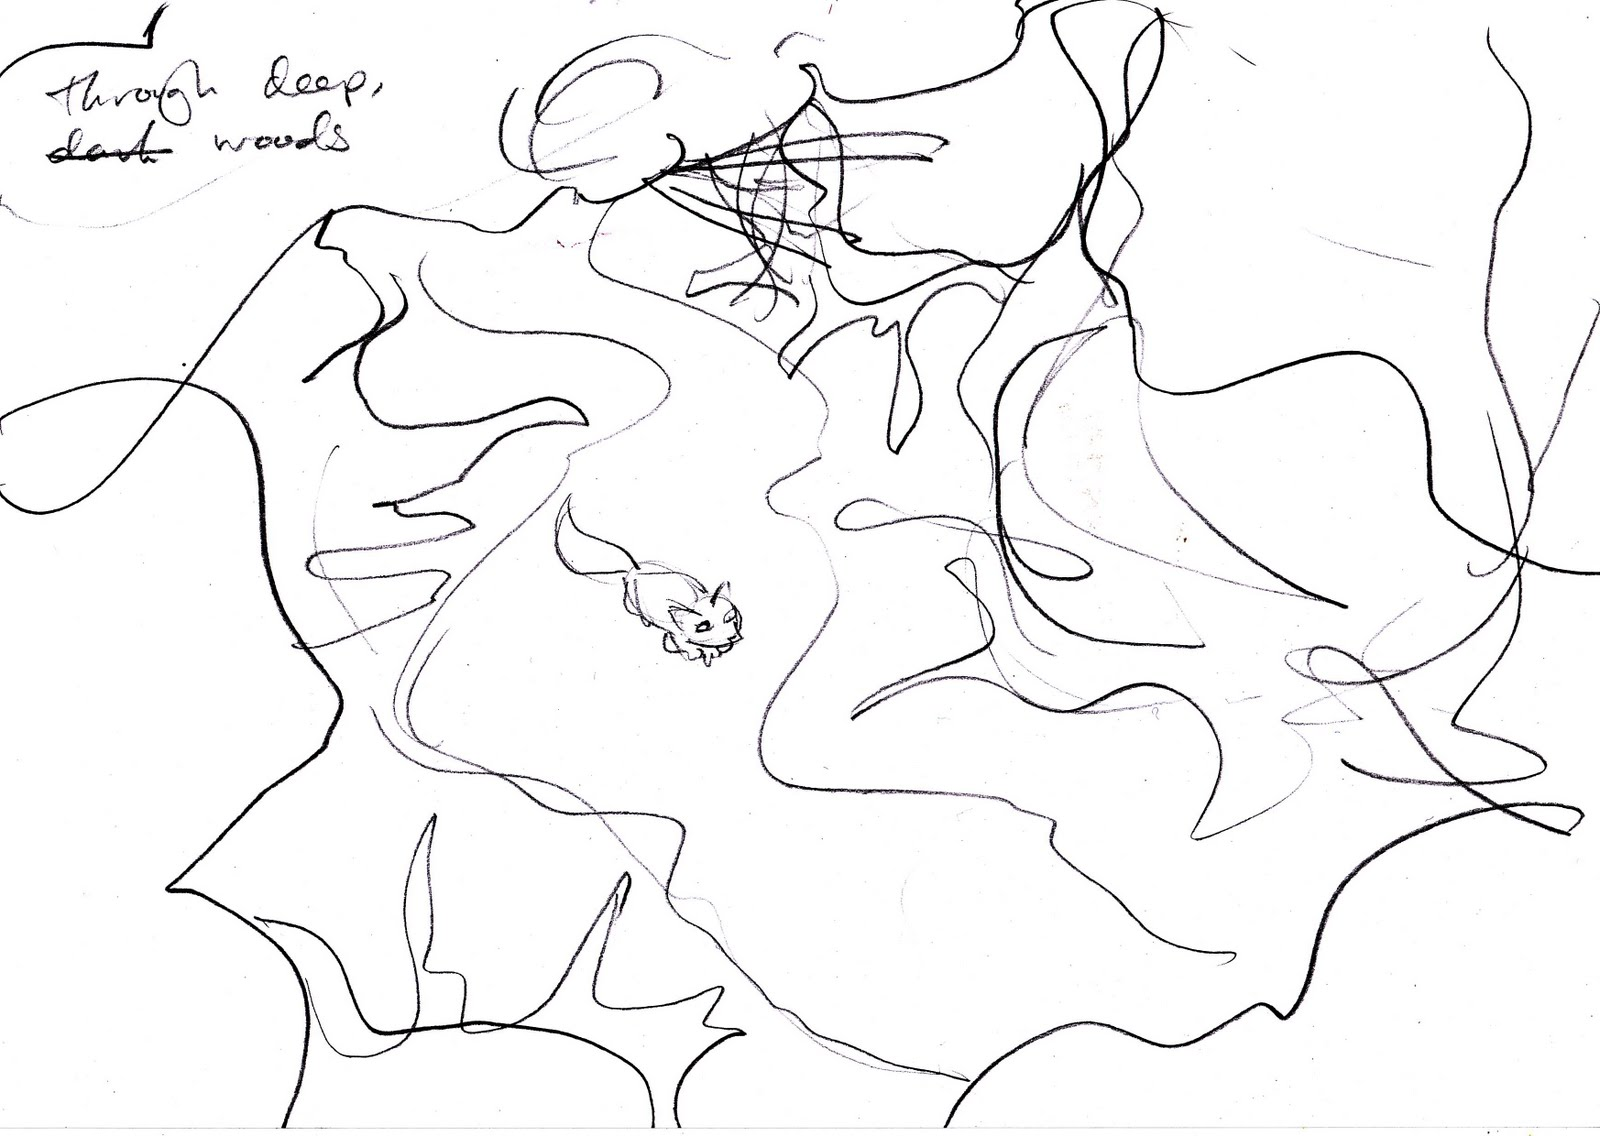 Rachael Smith Illustration: Through deep woods...